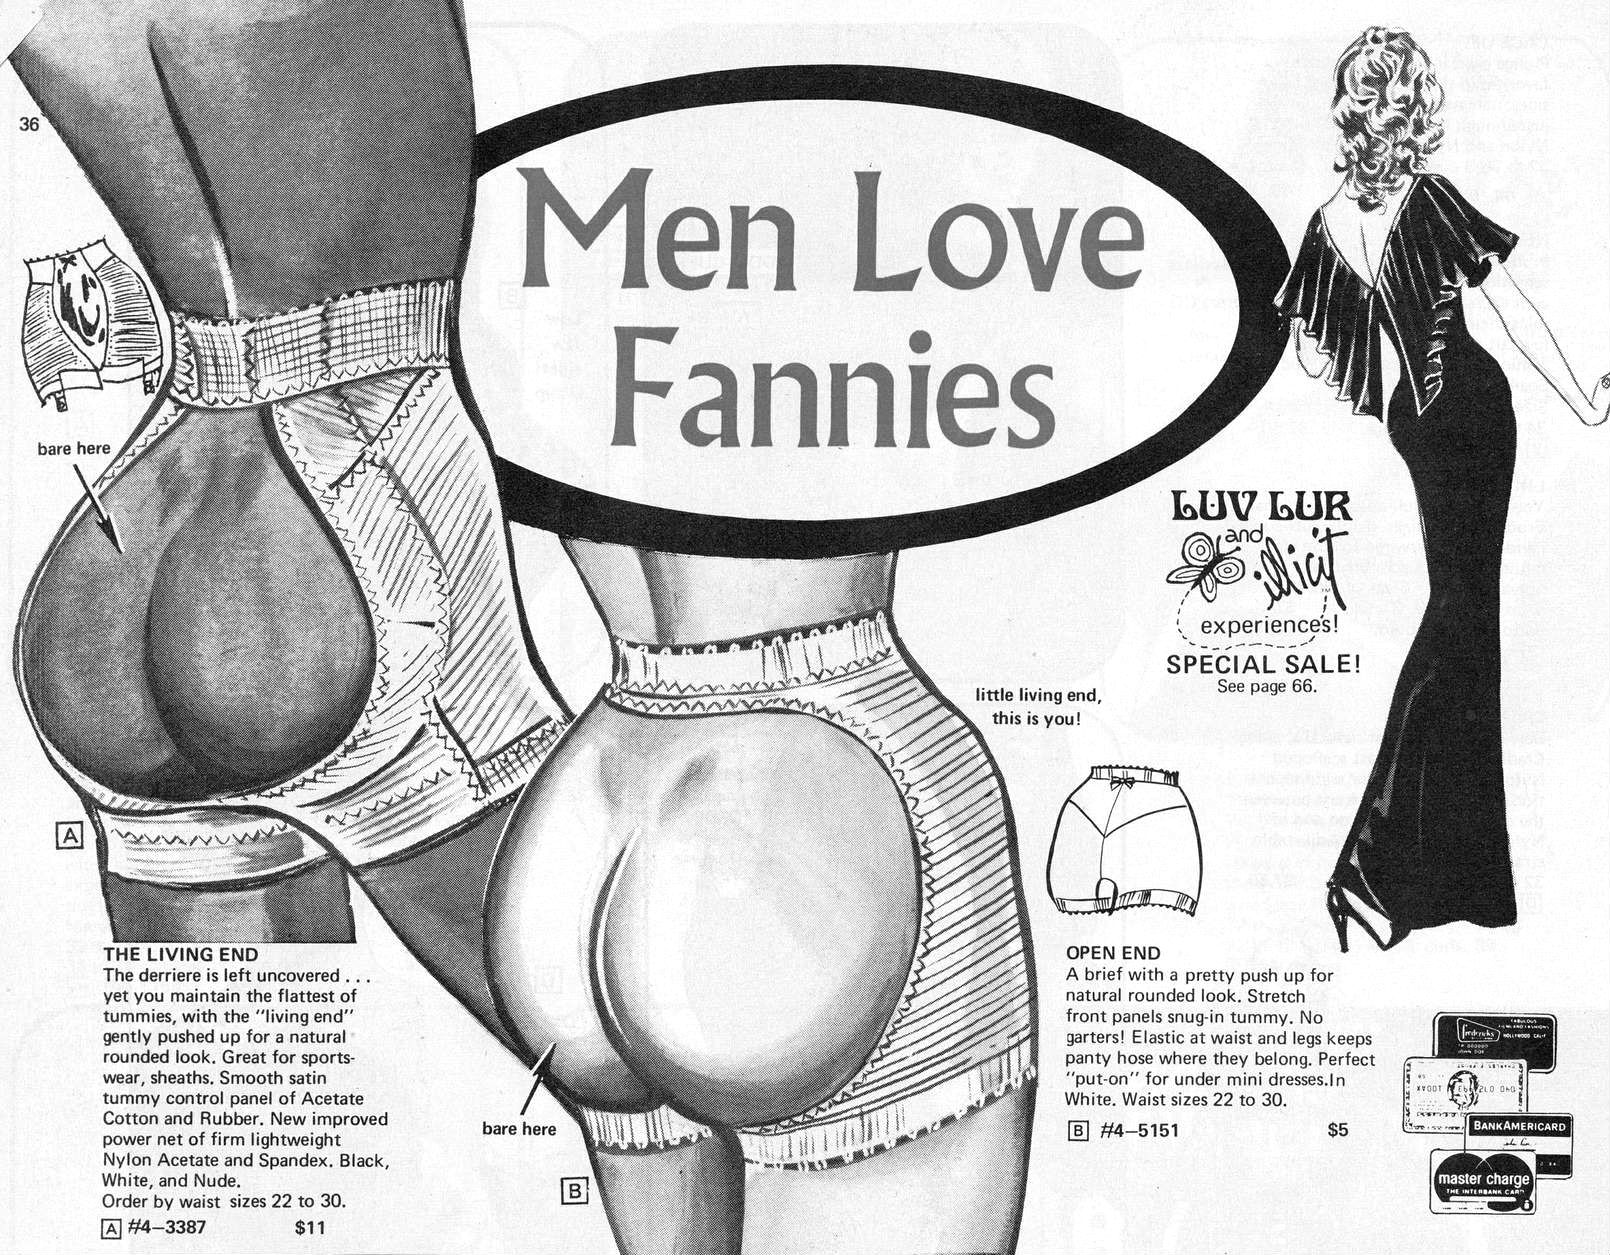 frederick's of holliwood vintage ad винтажная реклама нижнего белья